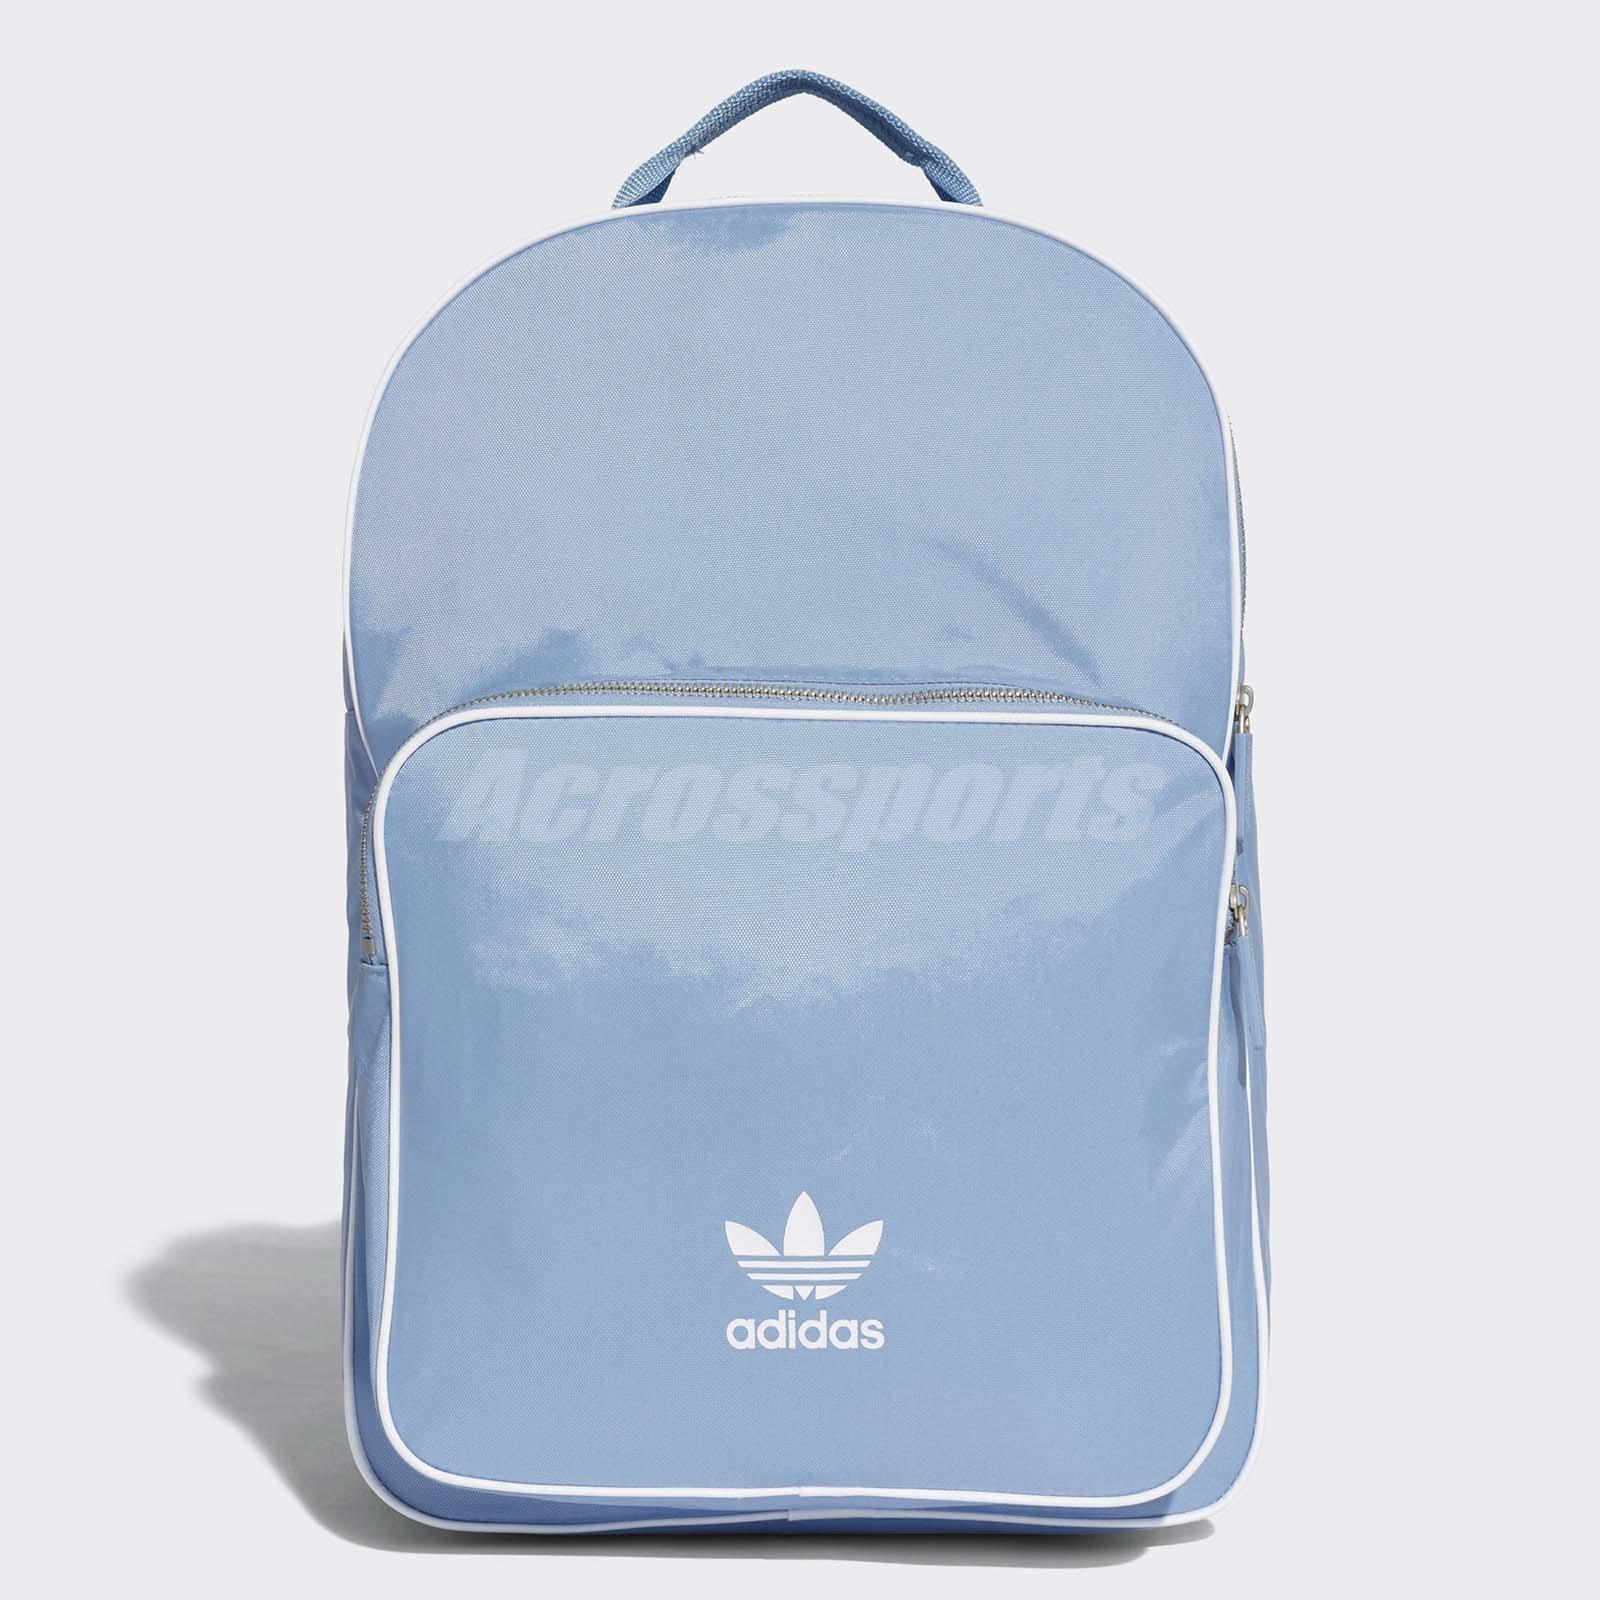 Details about adidas Unisex Originals Classic Backpack Heritage Trefoil Bag  Blue White CW0631 066b11ba30